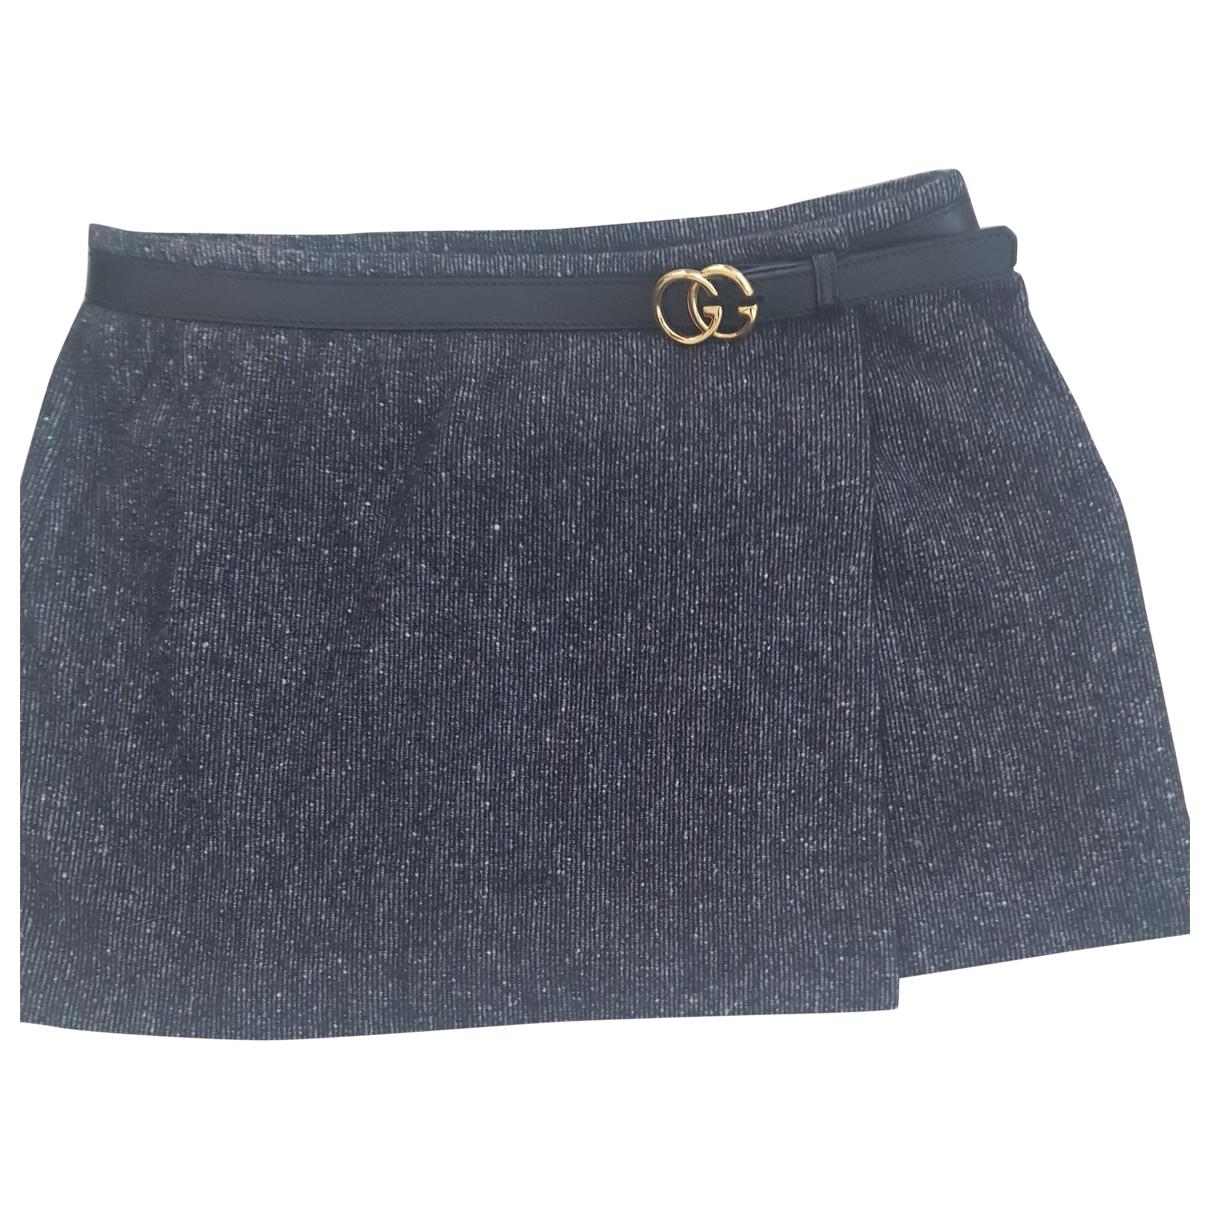 Gucci \N Black Wool skirt for Women 44 IT